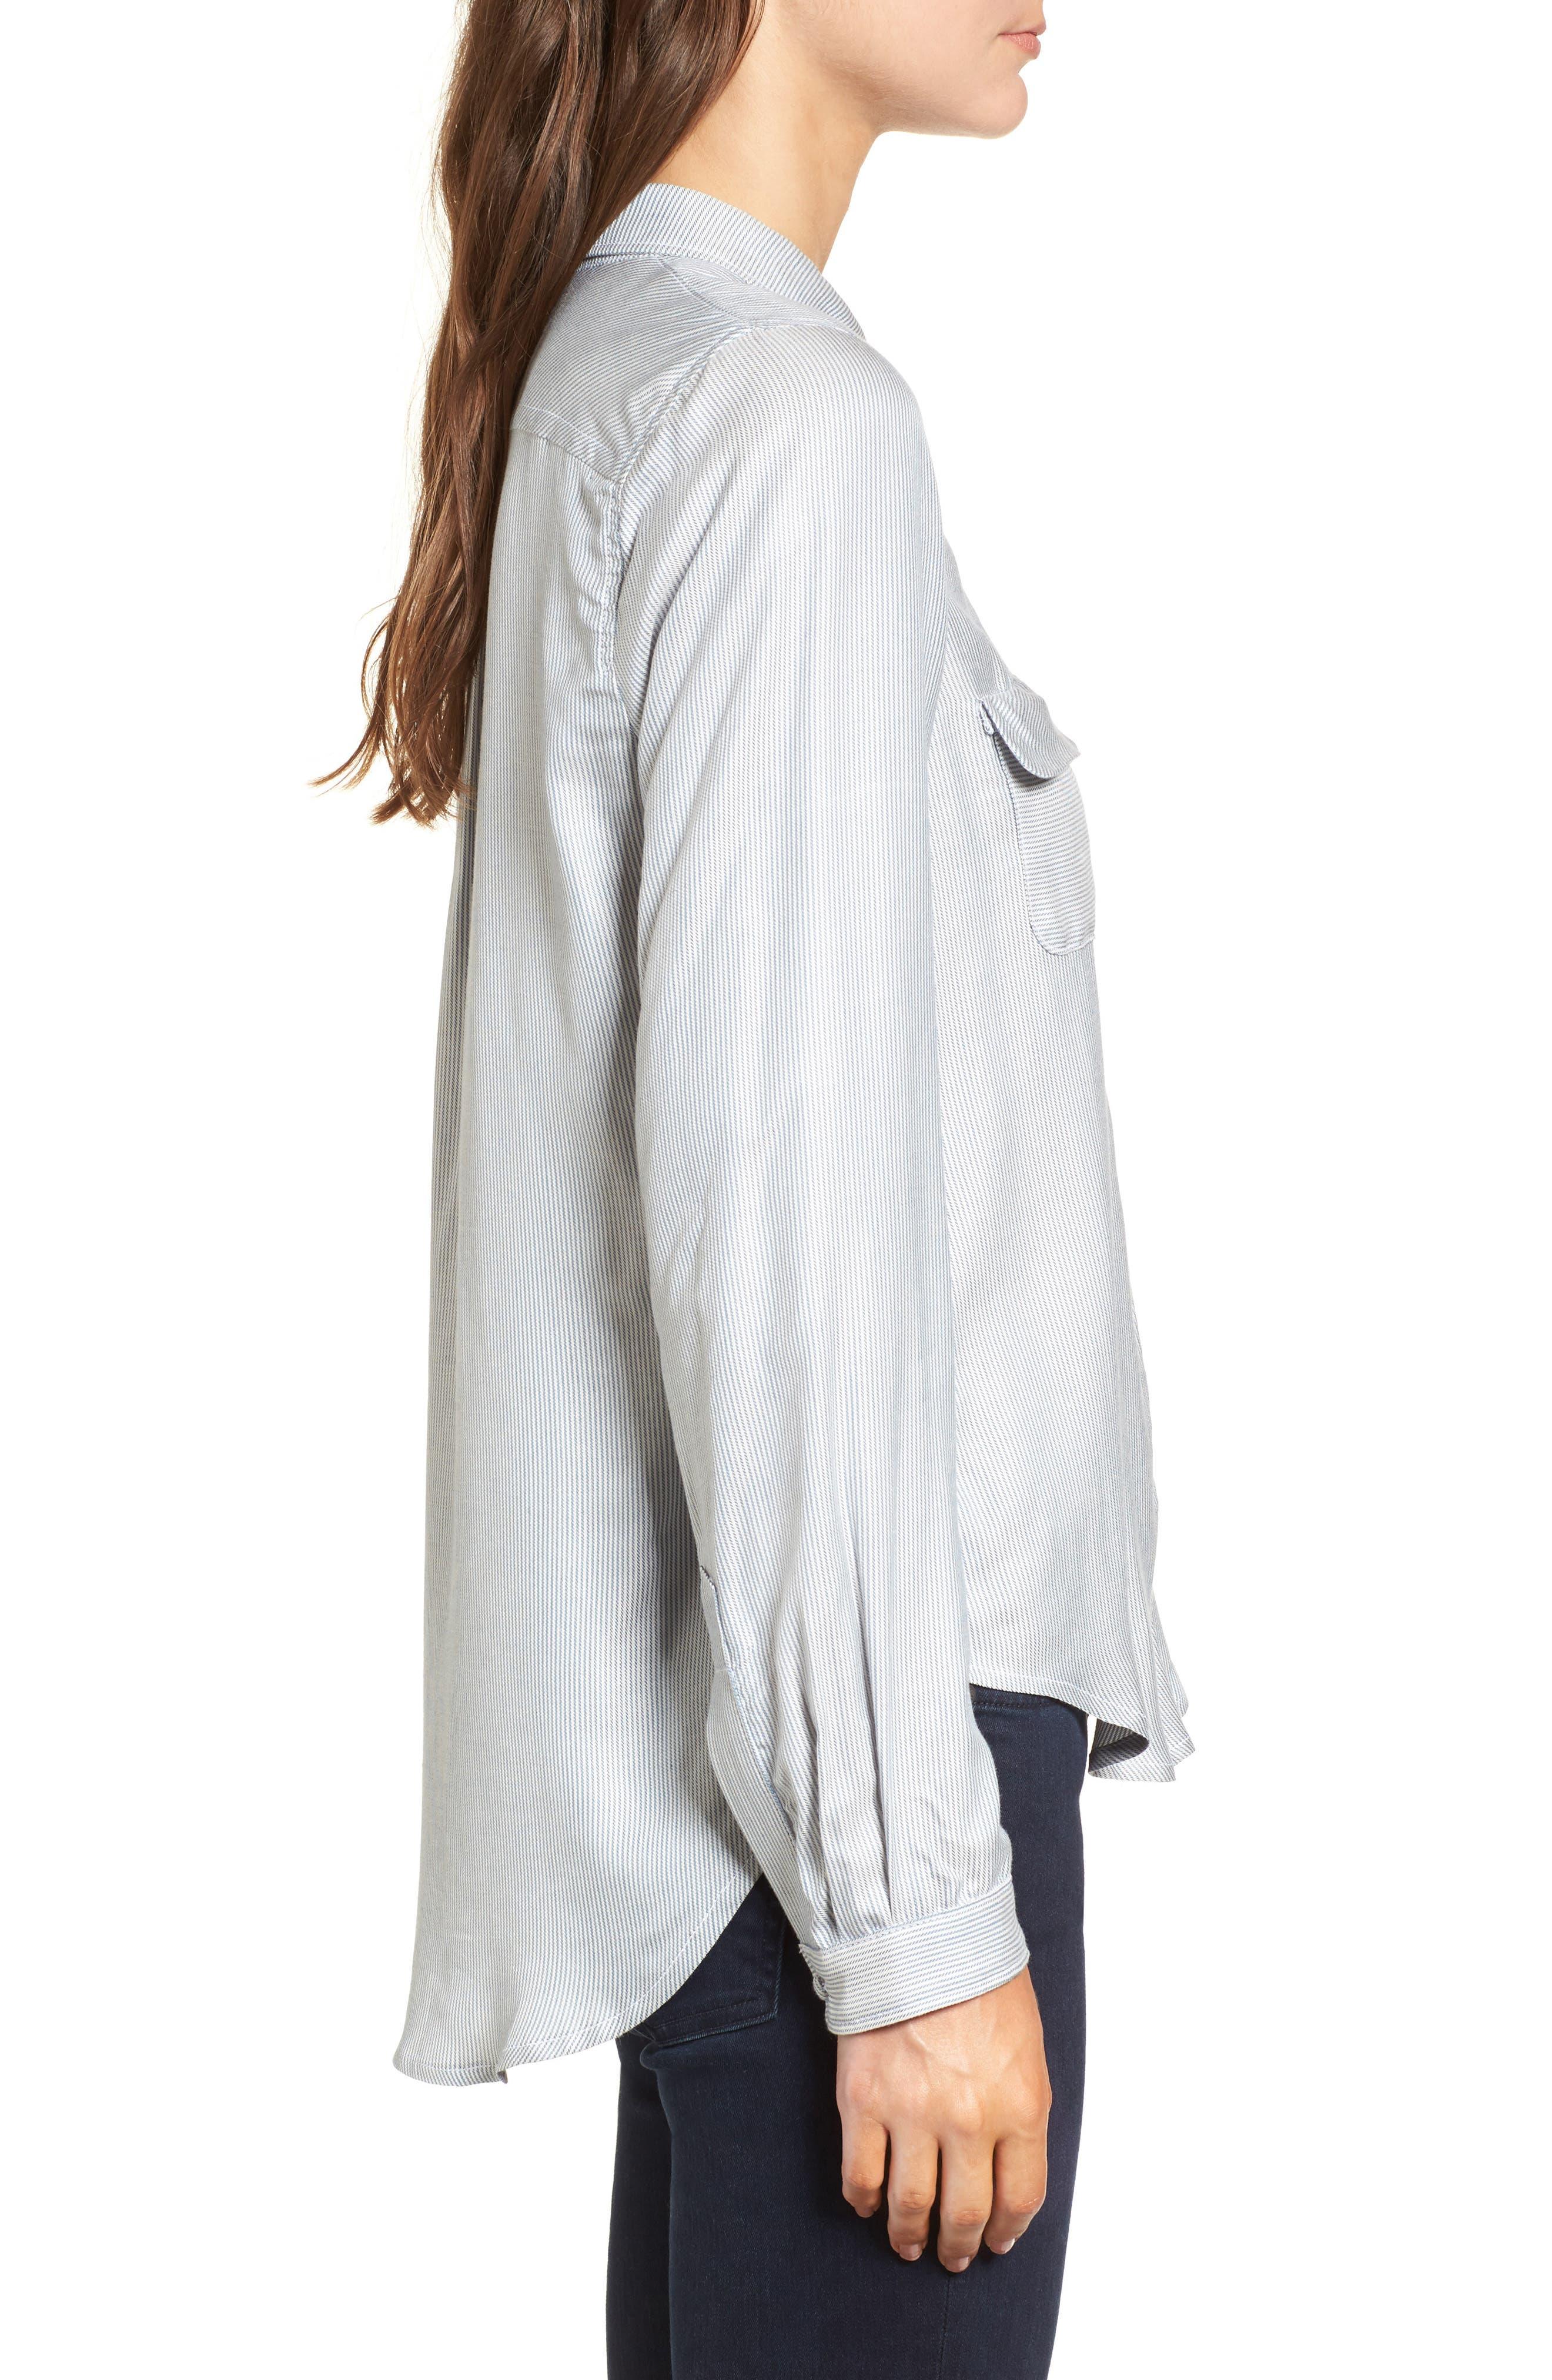 Berea Shirt,                             Alternate thumbnail 3, color,                             450